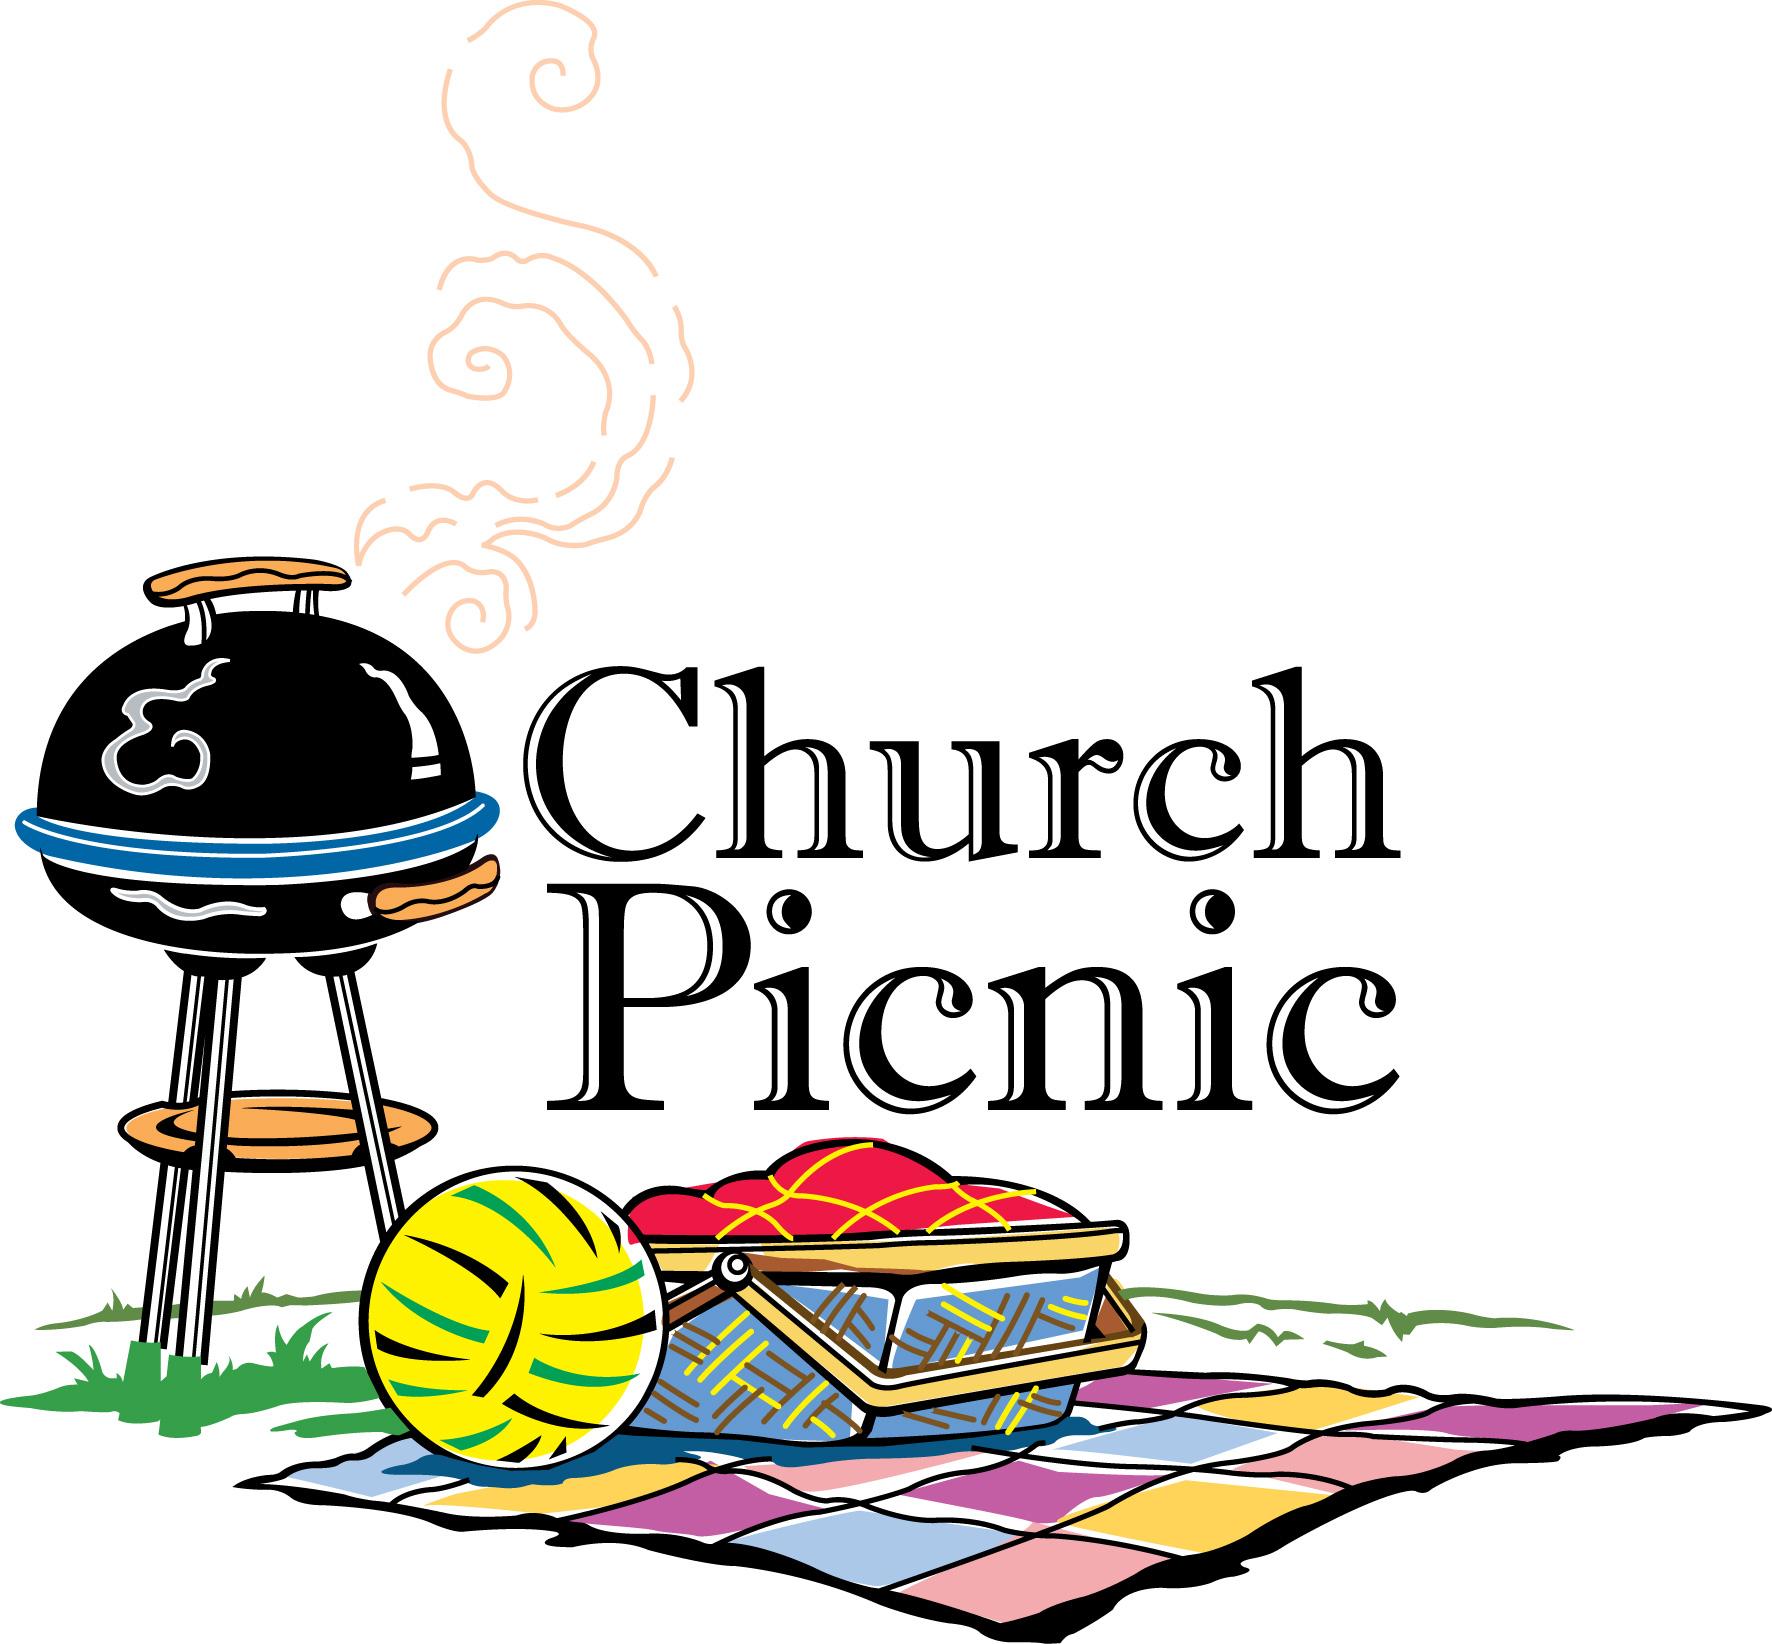 1772x1644 Best Church Picnic Clip Art